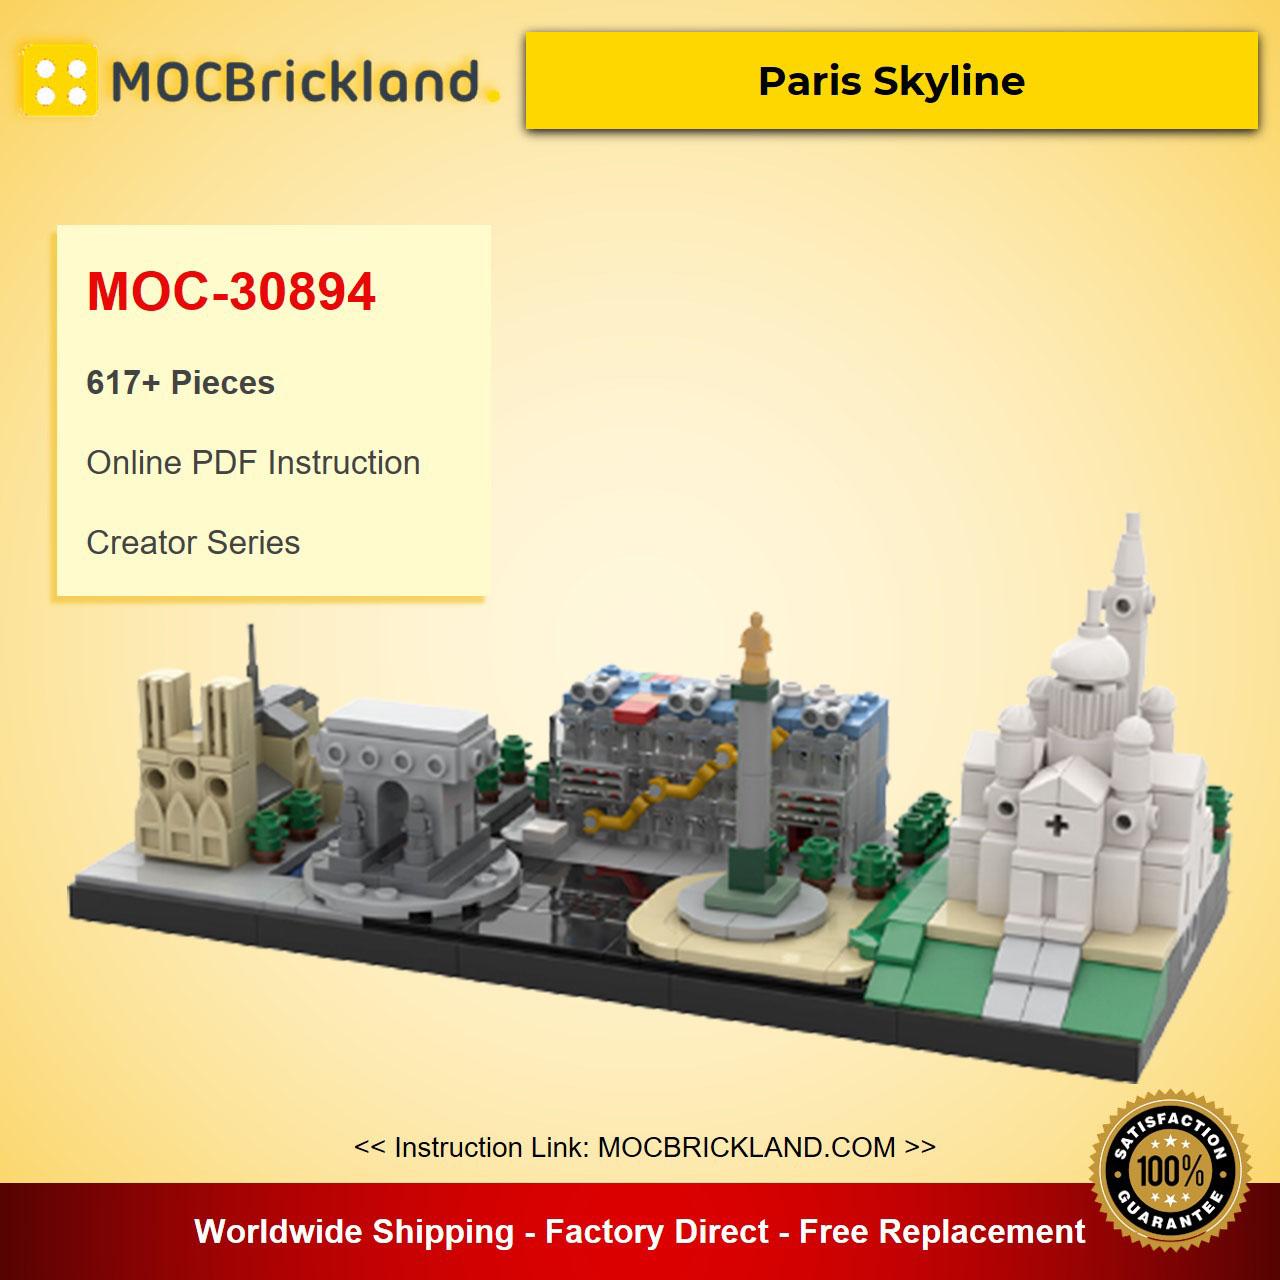 Paris Skyline MOC-30894 Creator Designed By JenArtiste With 617 Pieces